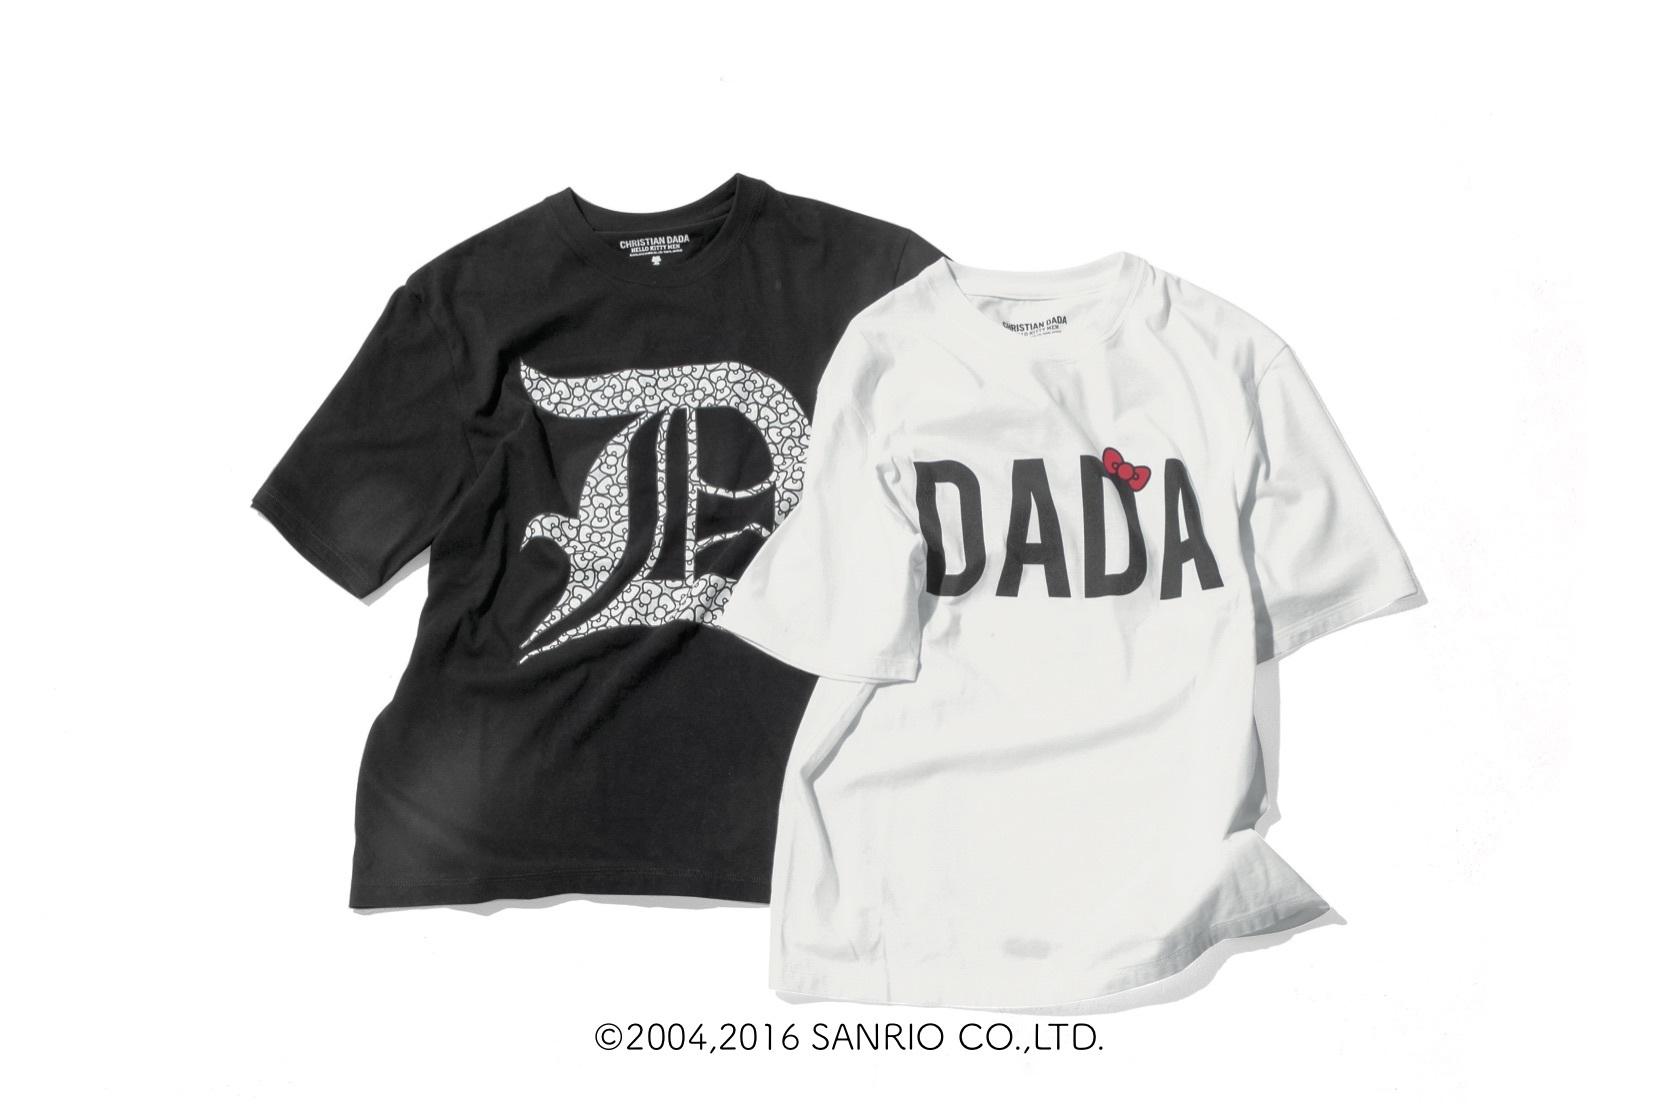 CHRISTIAN DADA Tシャツ 各10,800円